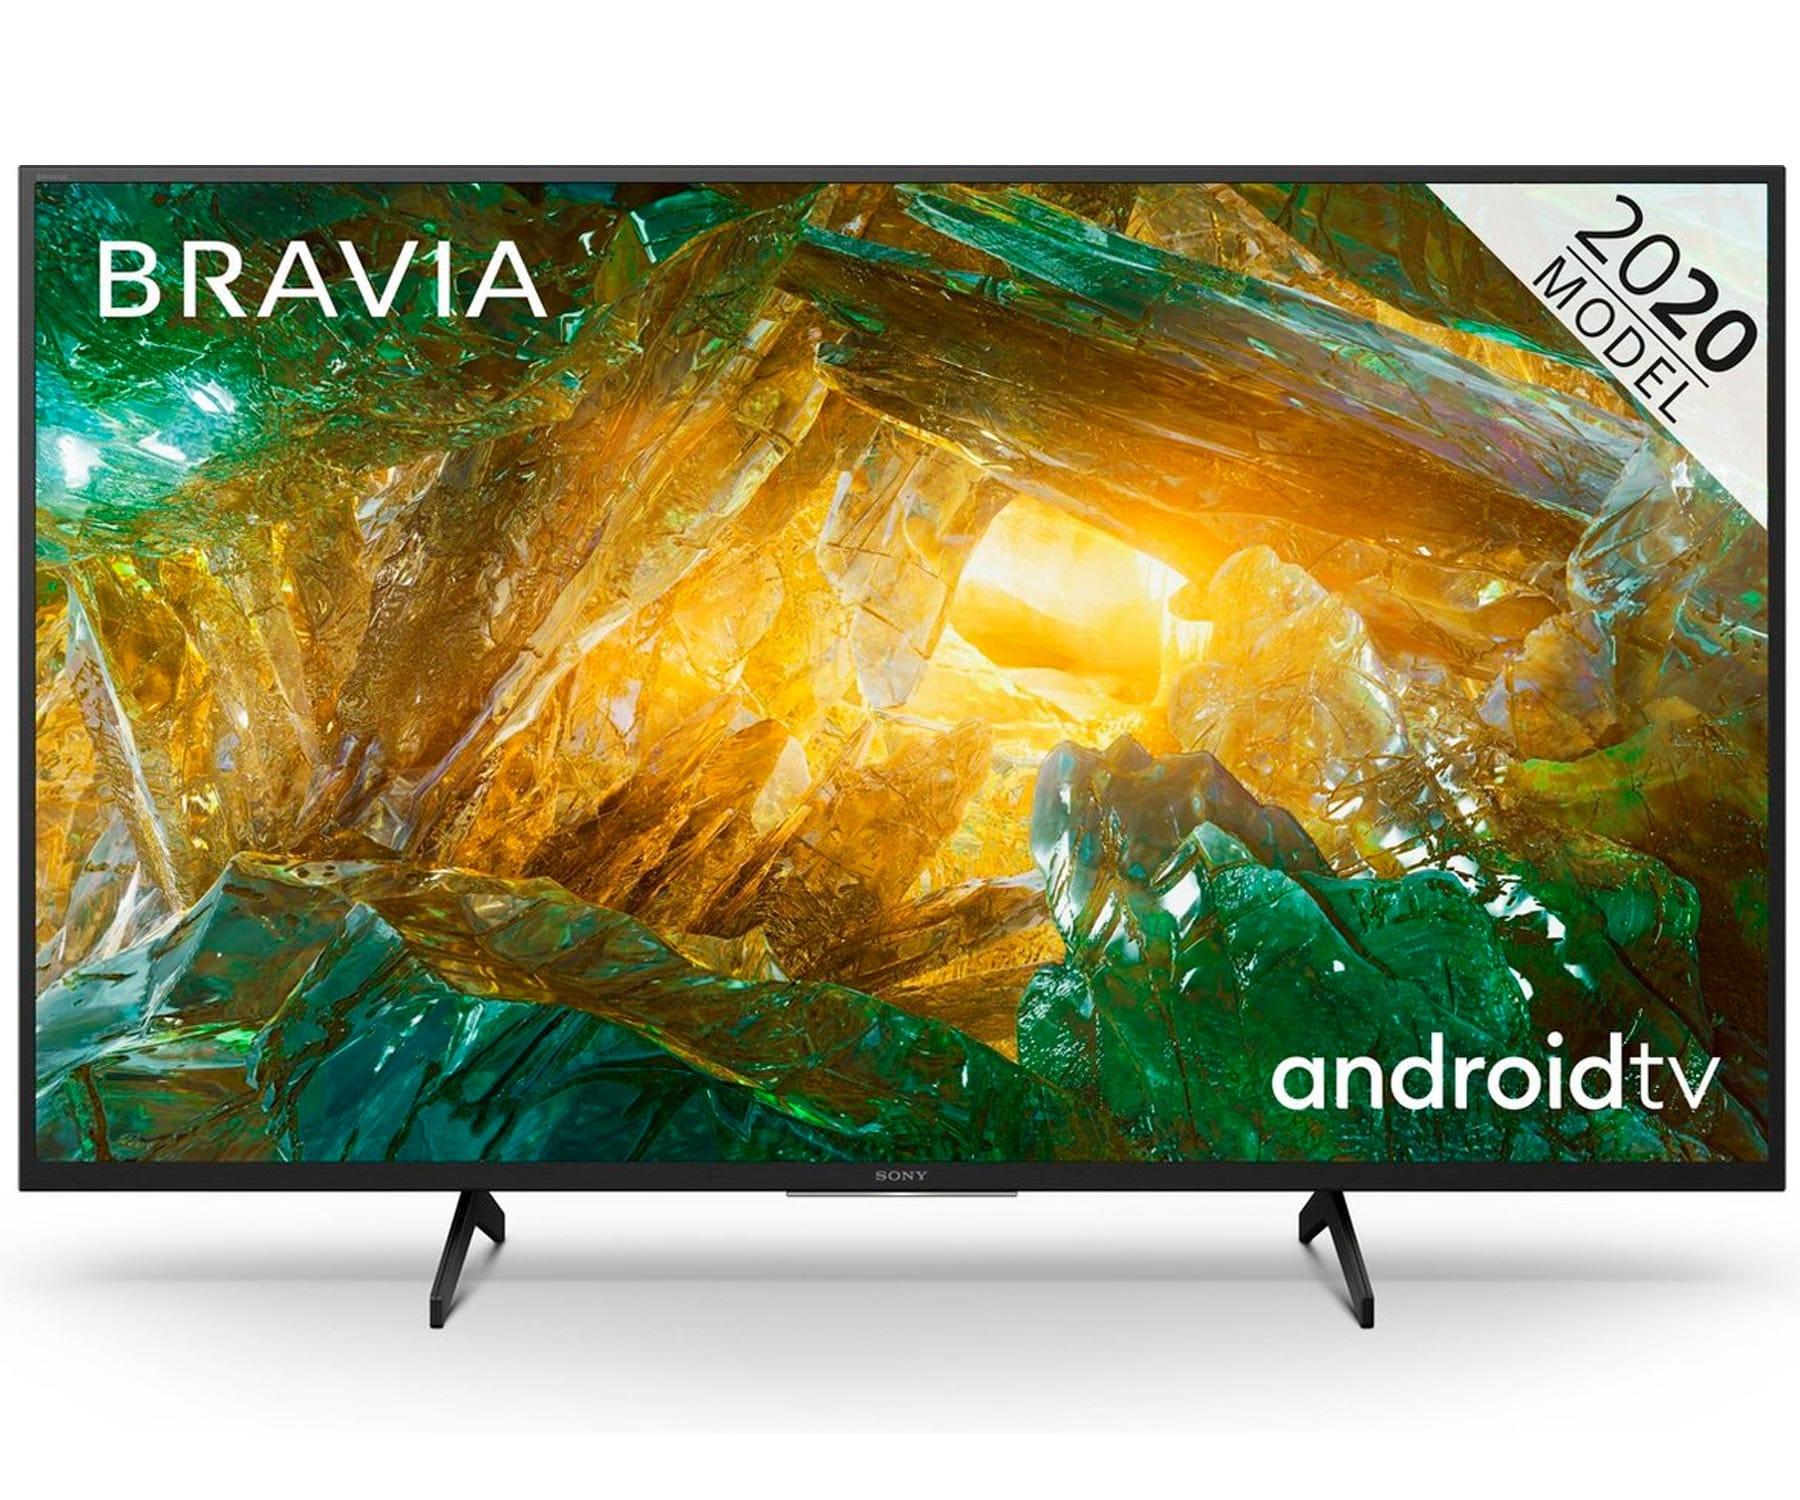 SONY KE-65XH8096 TELEVISOR 65'' DIRECT LED UHD 4K HDR ANDROID TV